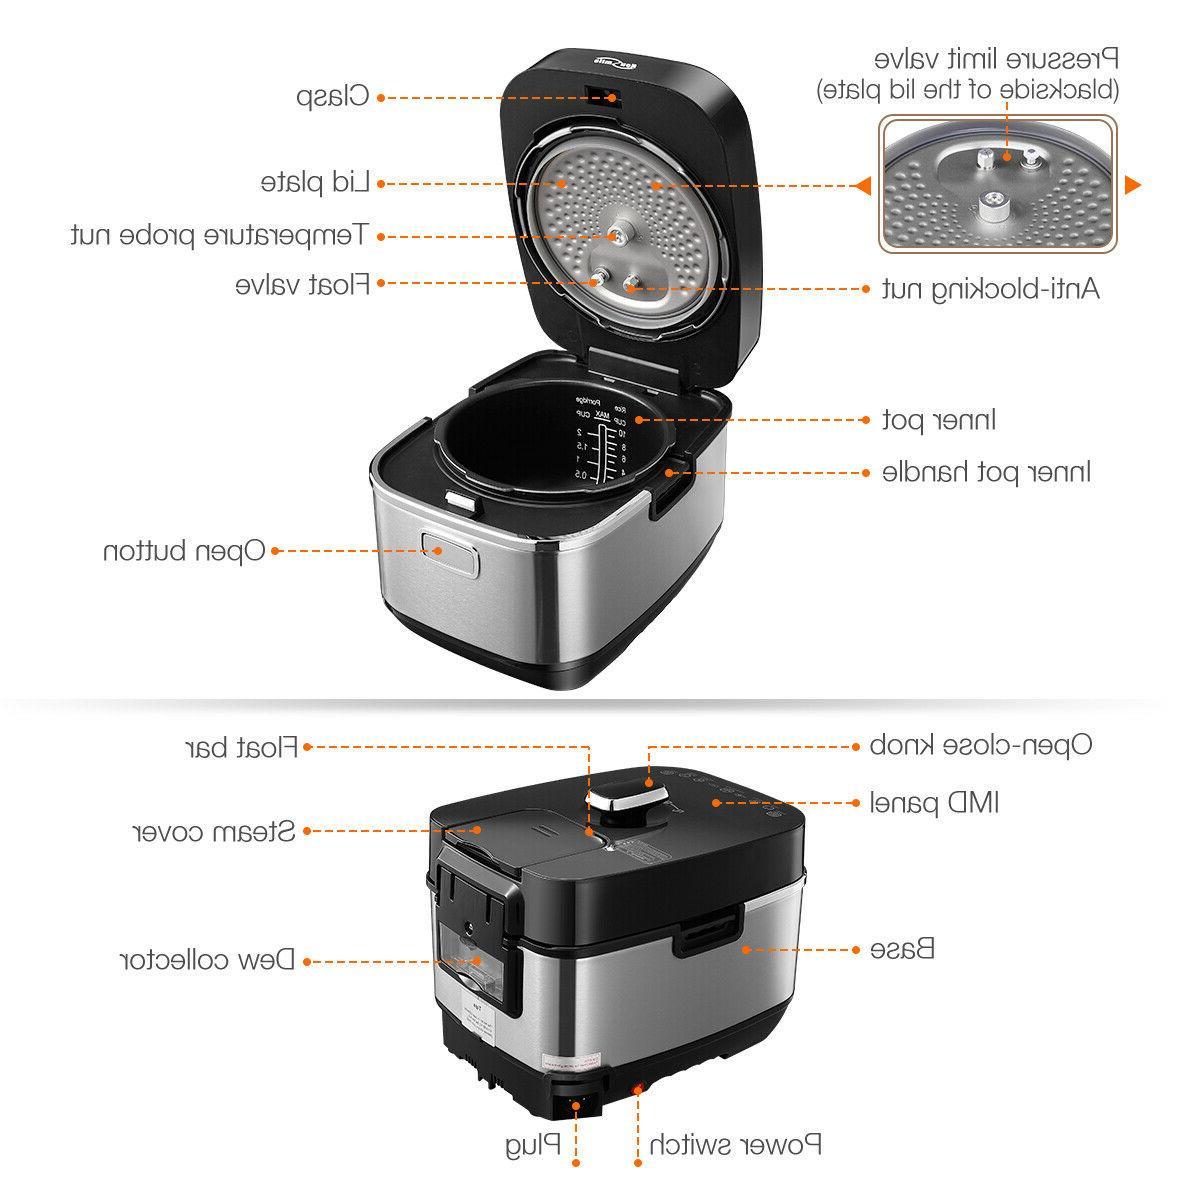 Housmile Electronics Smart Pressure 1000w